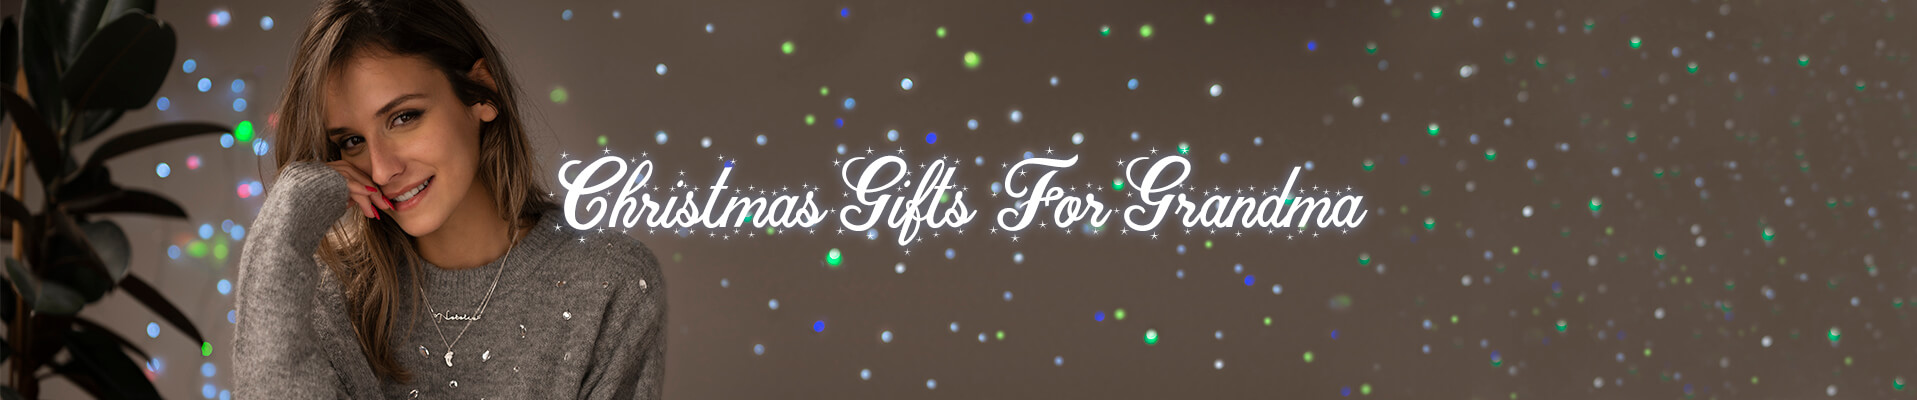 Christmas gifts for grandma desktop banner